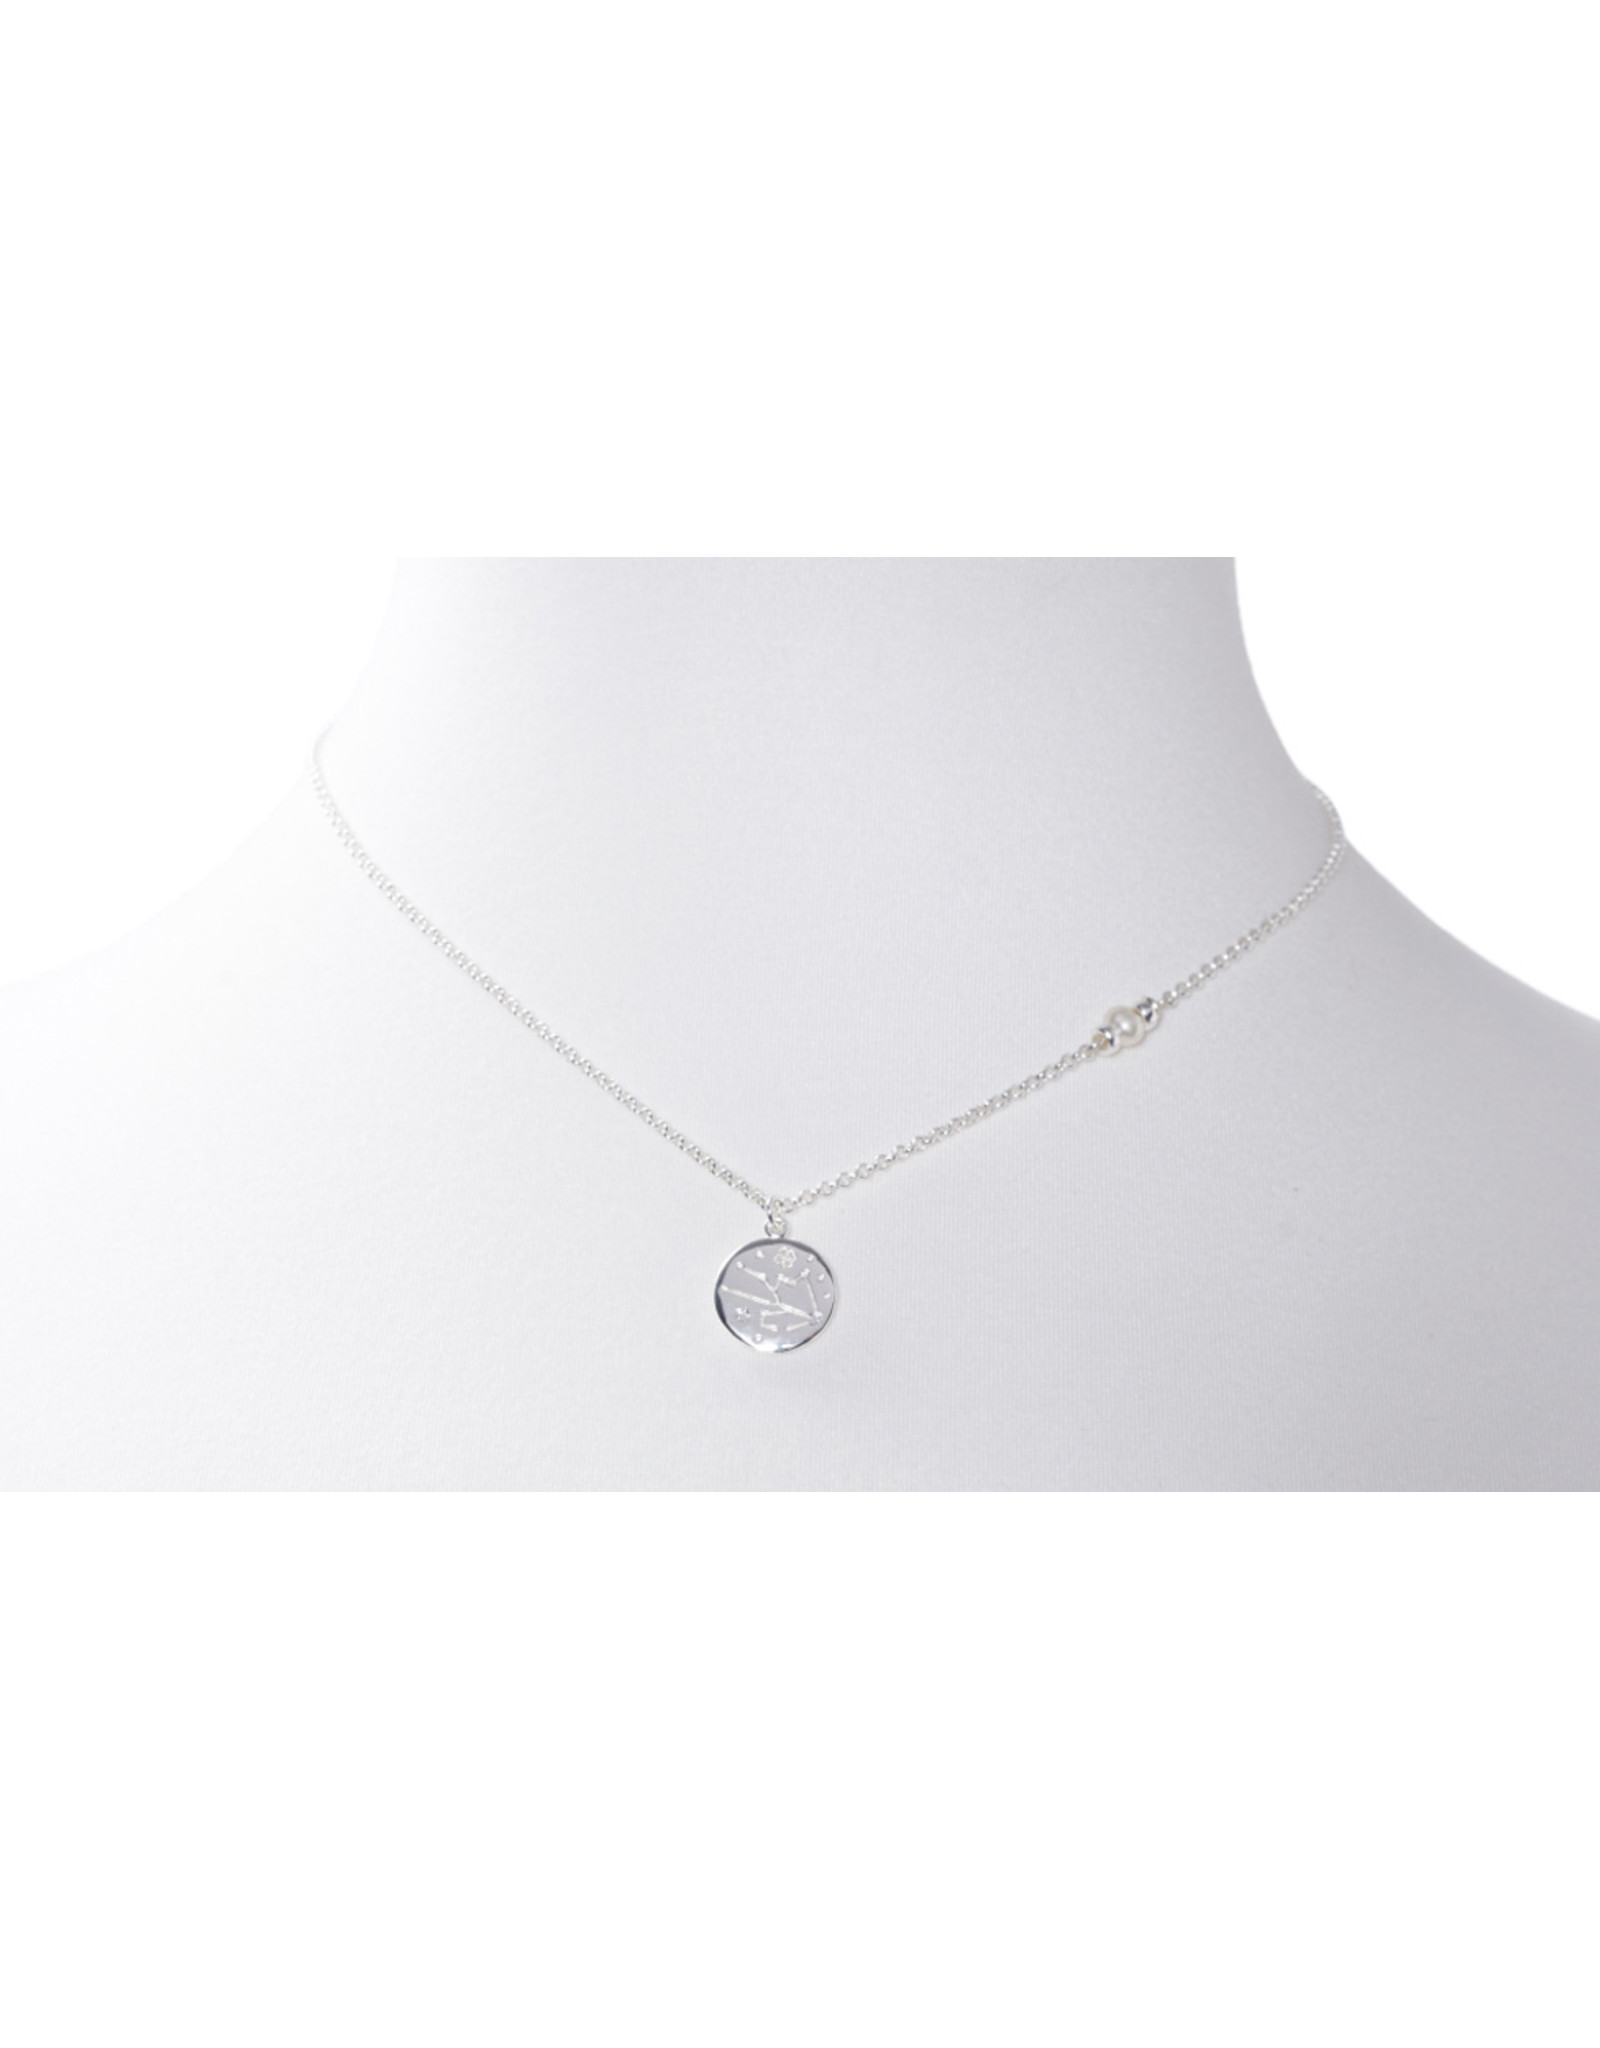 Beblue beblue Silver Chain Zodiac Sign, Leo (BCHYOUR-LEO)